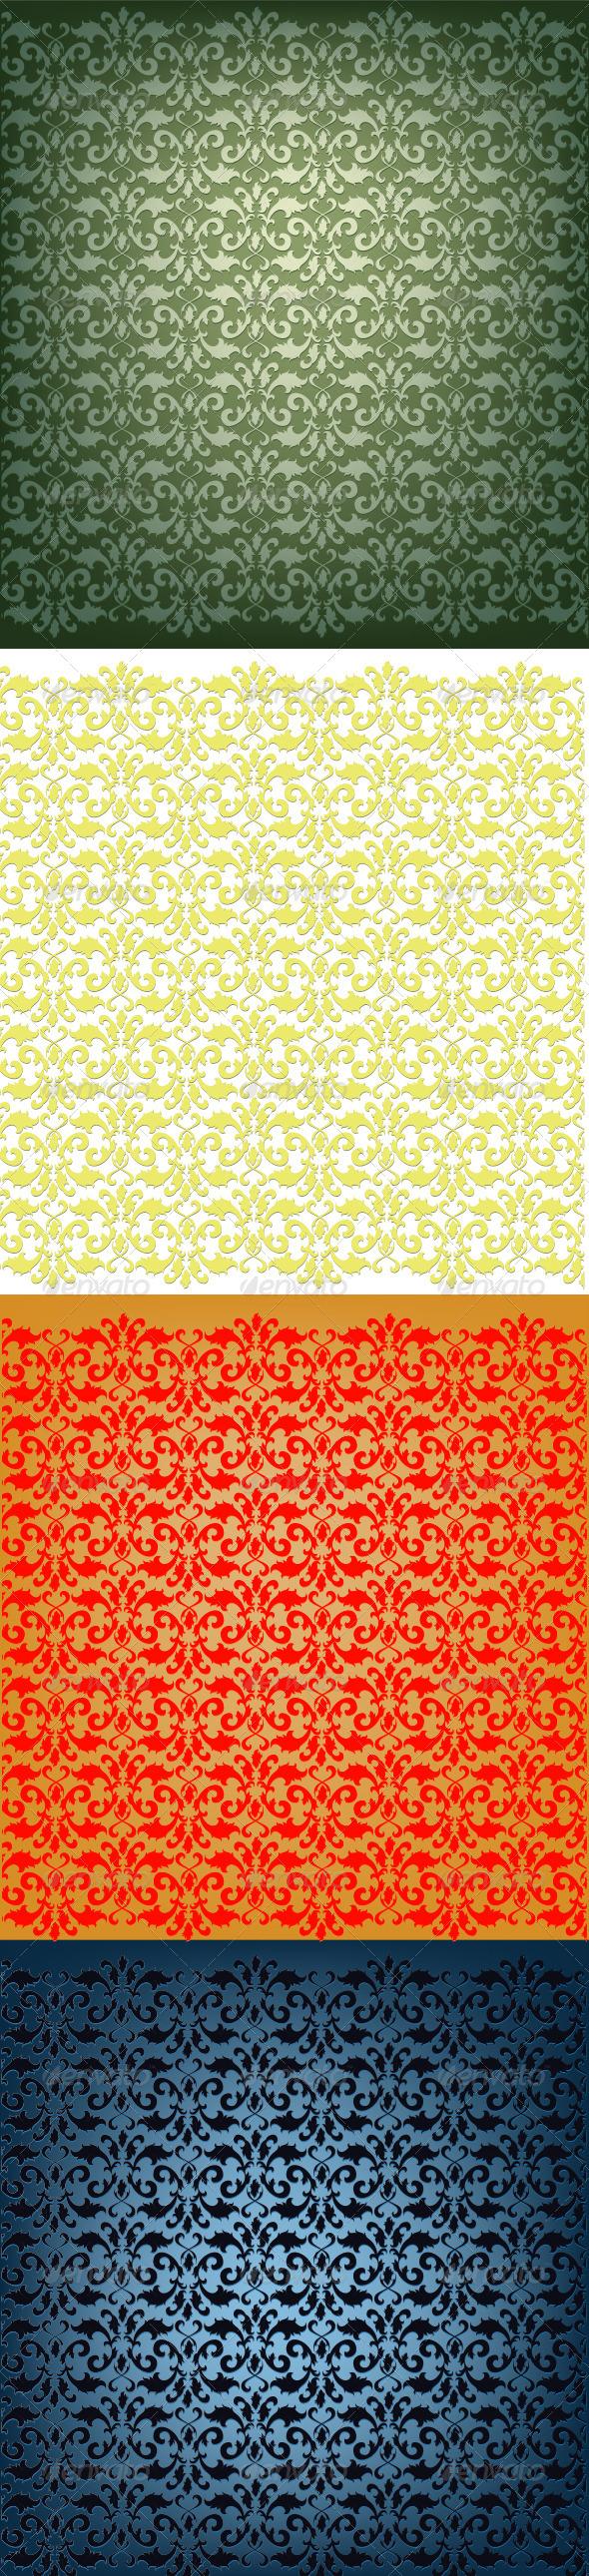 GraphicRiver Pattern 5245675